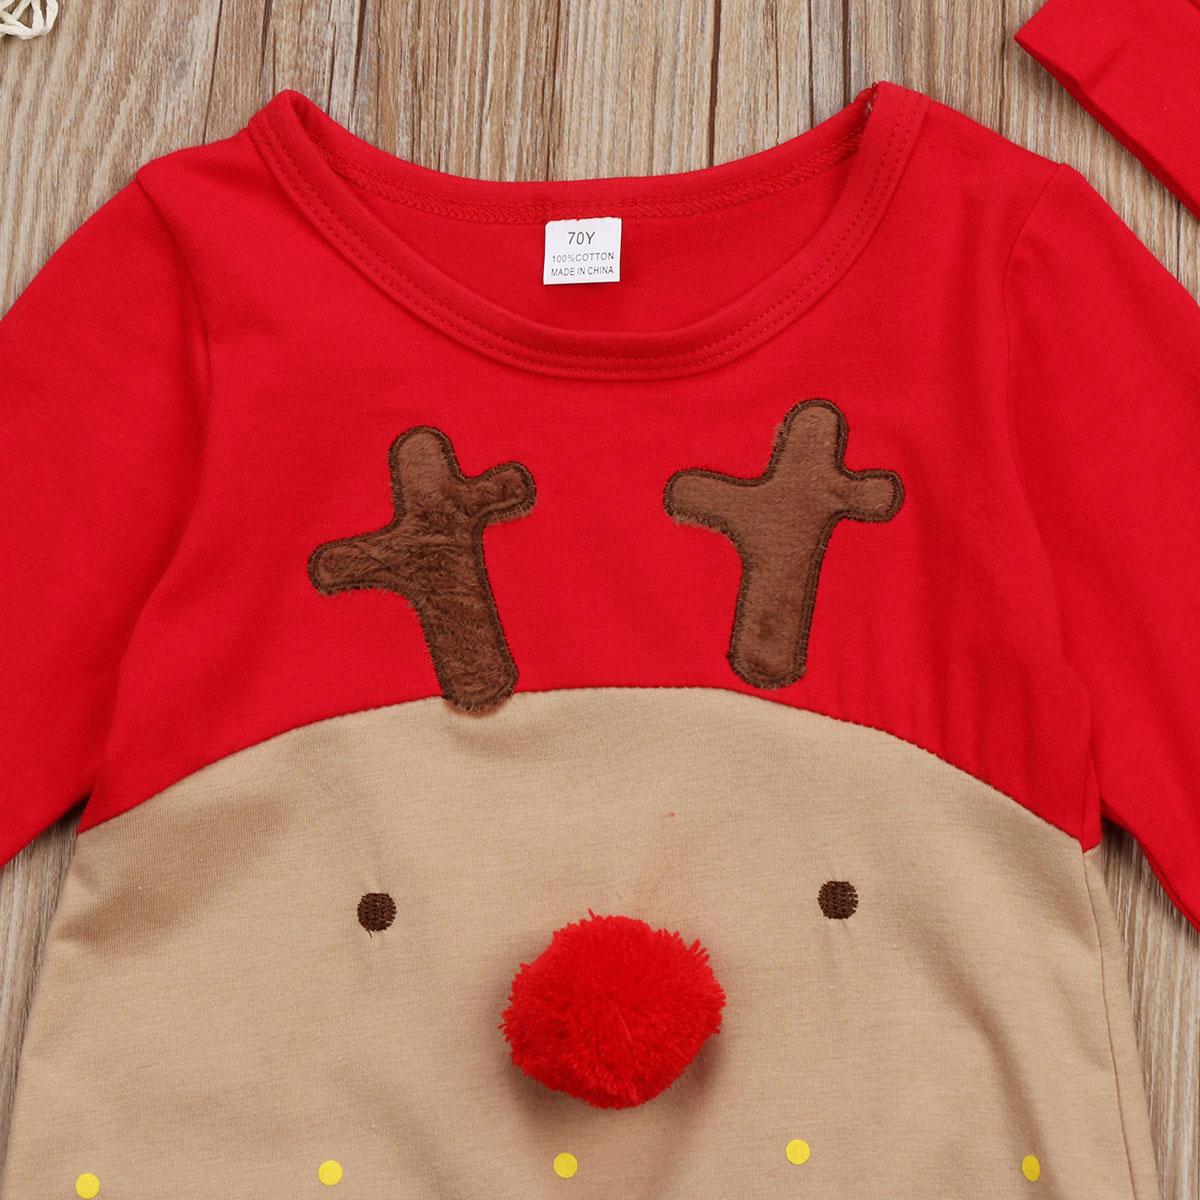 HTB1ZTChXzzuK1RjSspeq6ziHVXap 2Pcs Newborn Baby Boys Girl Christmas Rompers Long Sleeve Deer Romper Jumpsuit Hat Sleepwear Party Costume Baby Clothes